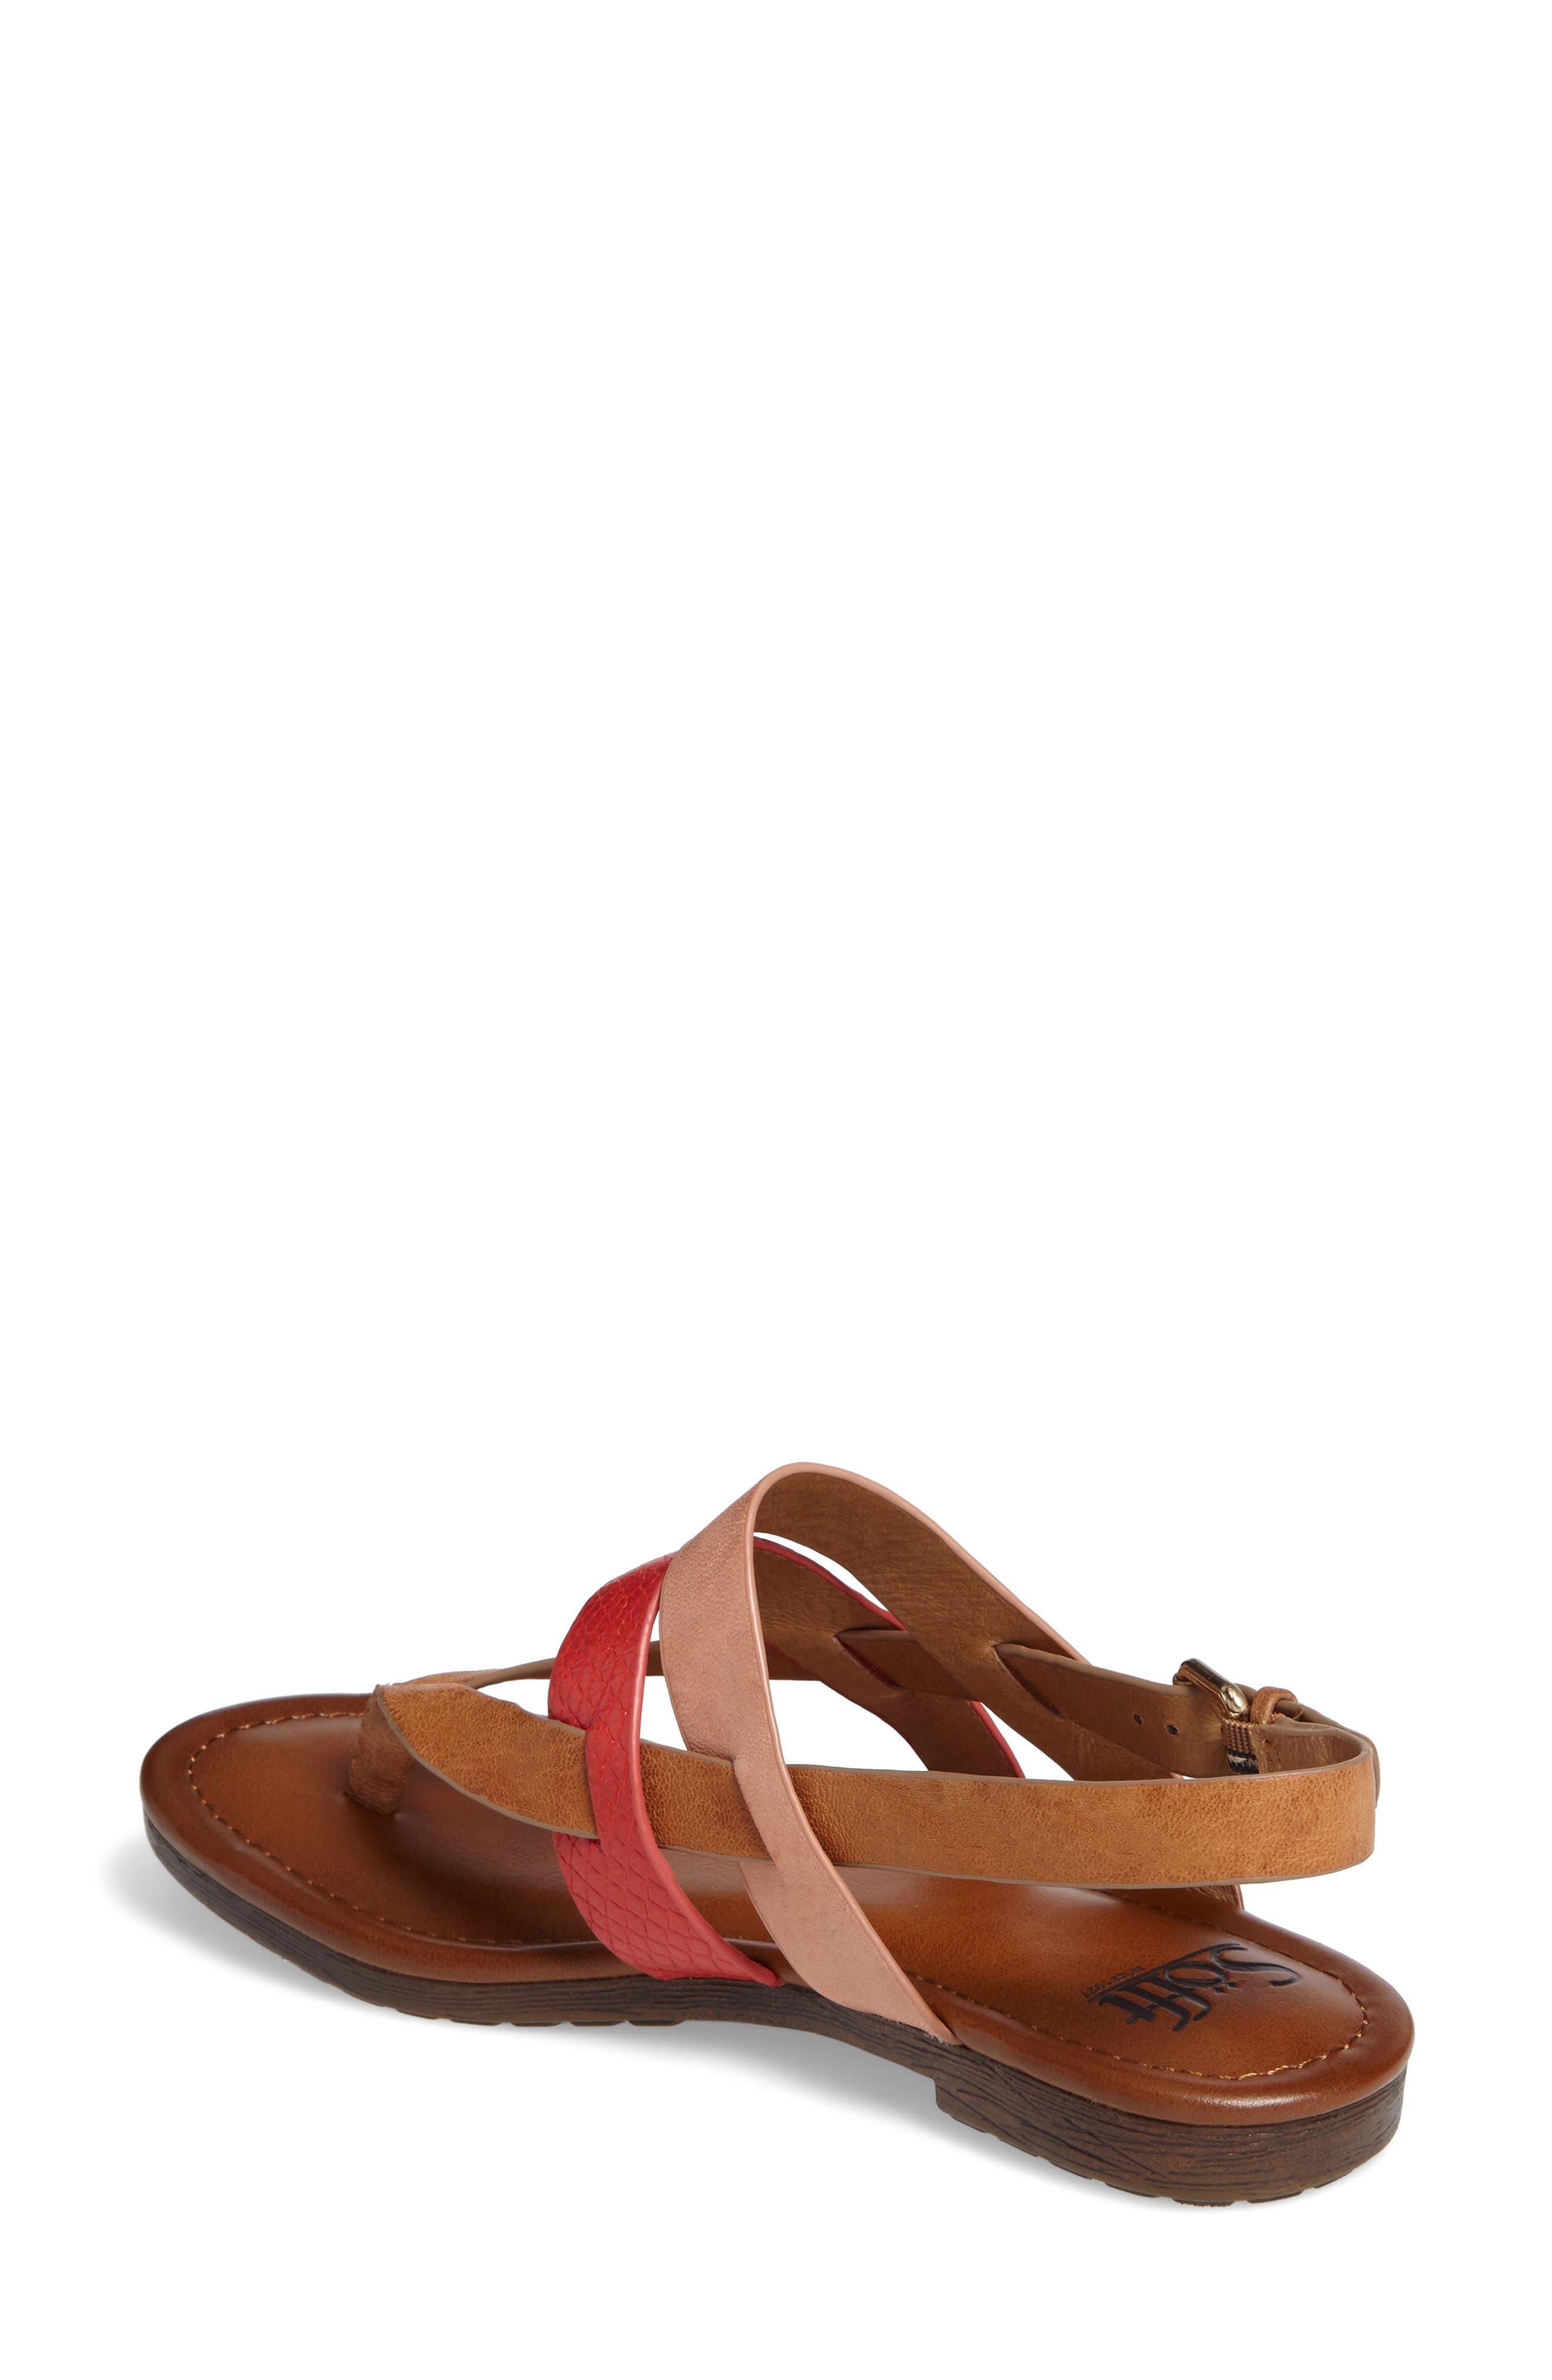 Bena Strappy Sandal,                             Alternate thumbnail 5, color,